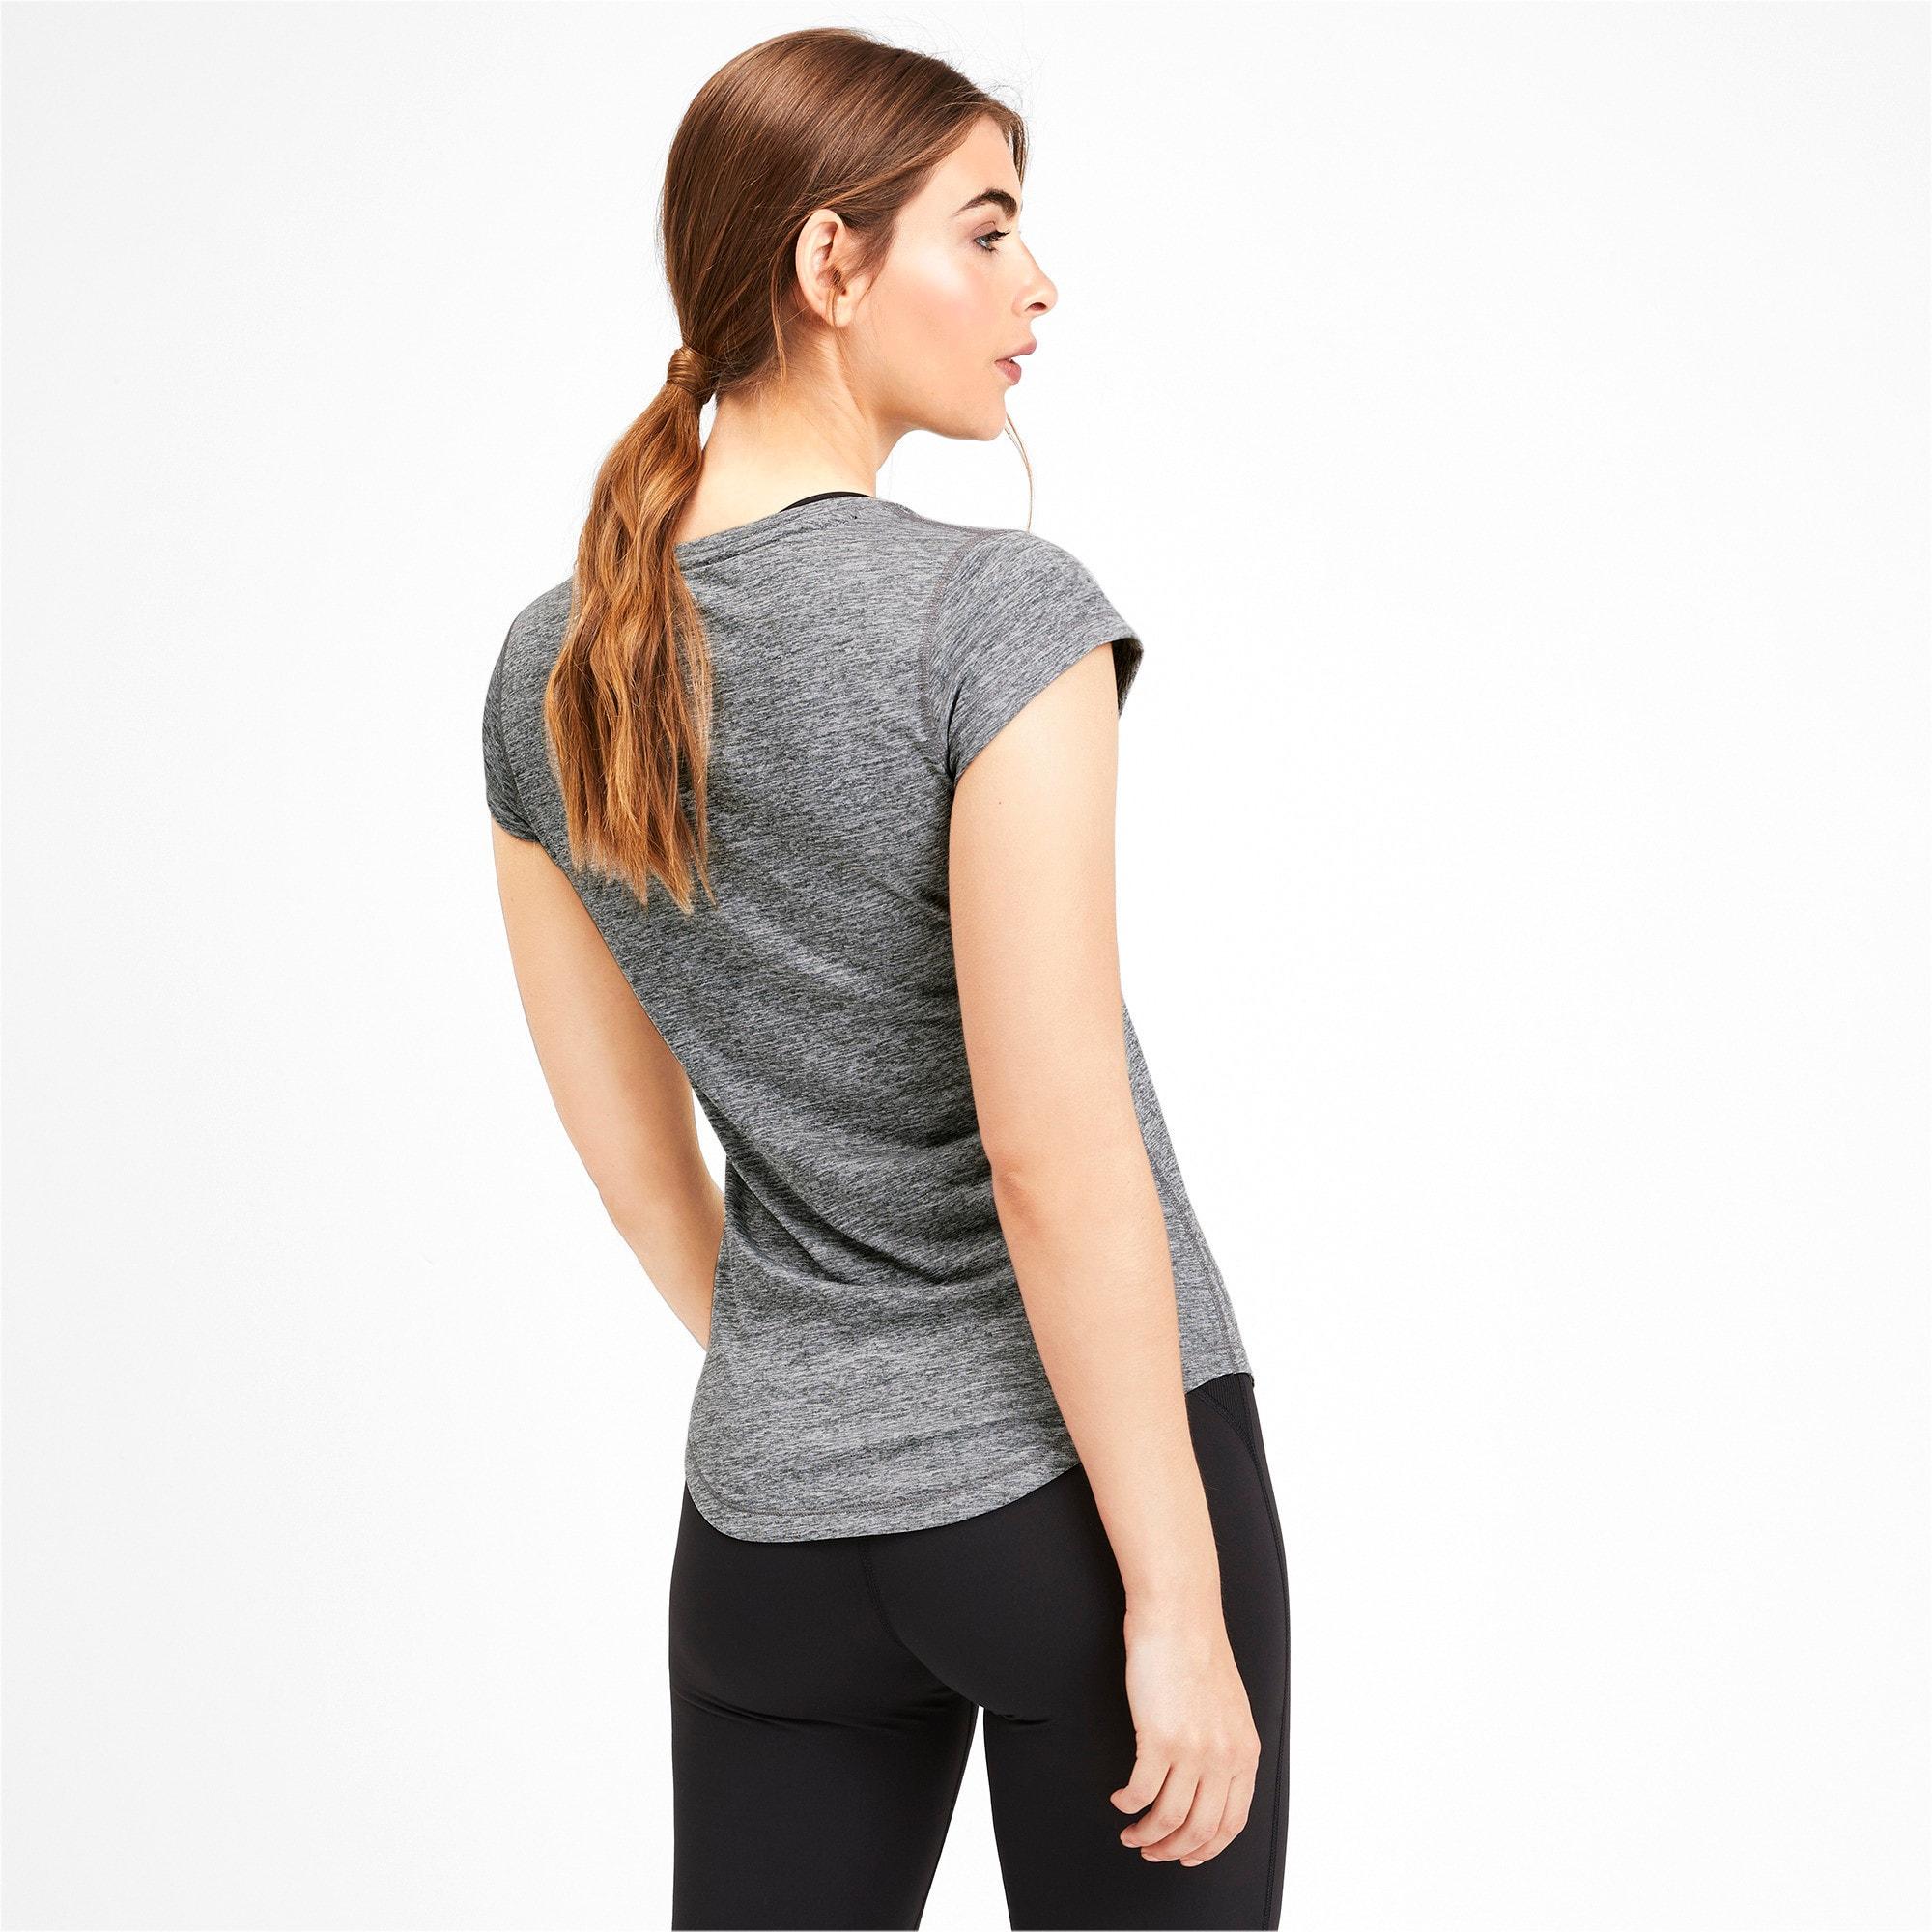 Thumbnail 2 of ヘザー キャット ウィメンズ ランニング Tシャツ 半袖, Medium Gray Heather, medium-JPN